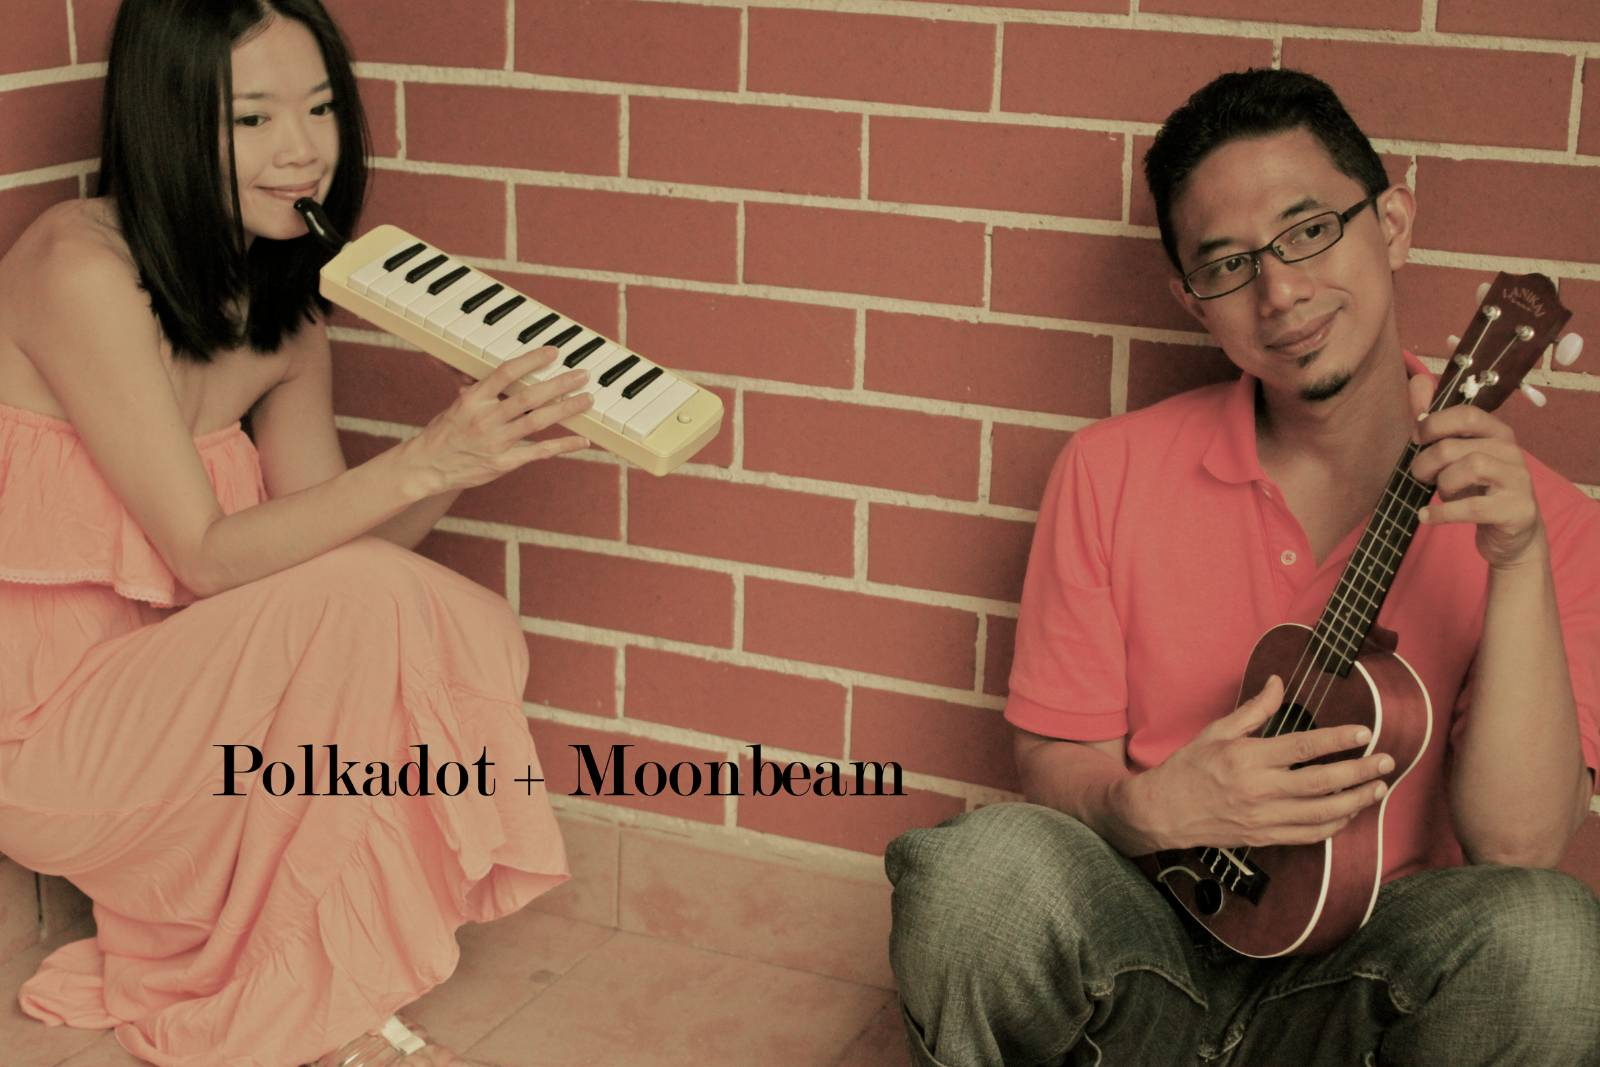 Hummingbird - Polkadot + Moonbeam 5